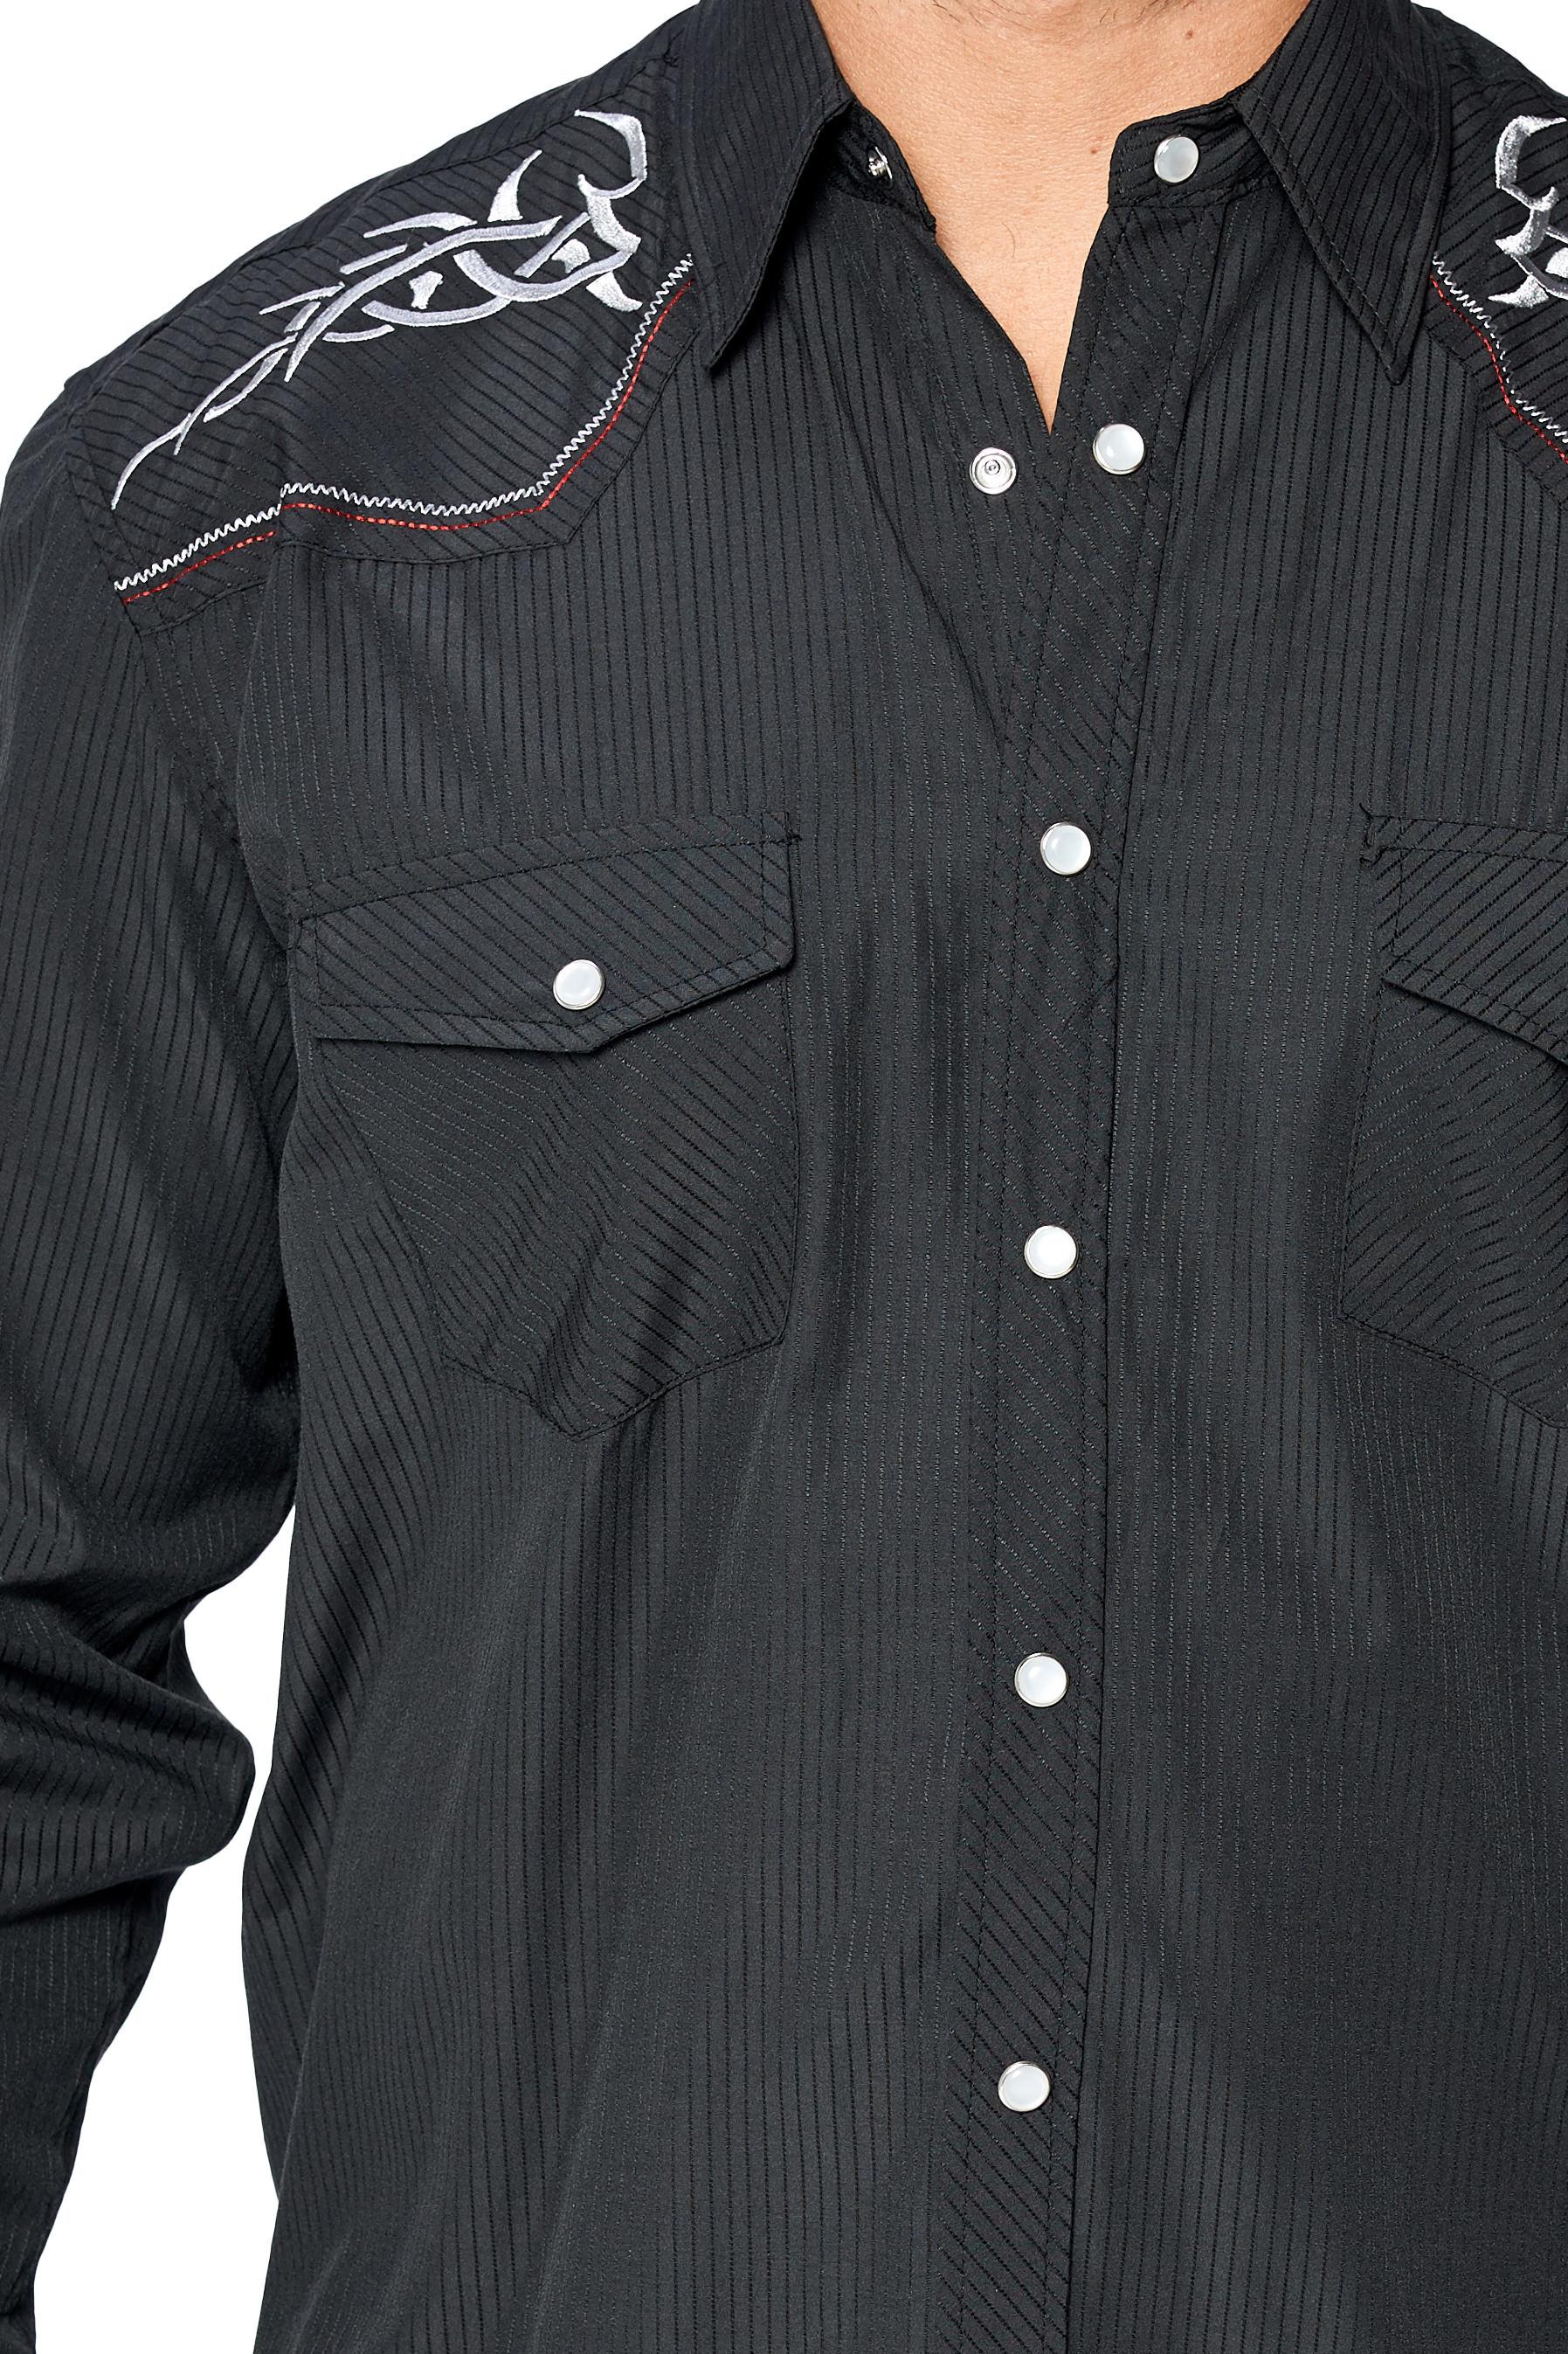 LW-Men-039-s-Pearl-Snap-Tribal-Stylish-Printed-Woven-Western-Vaquero-Rodeo-Shirt thumbnail 54